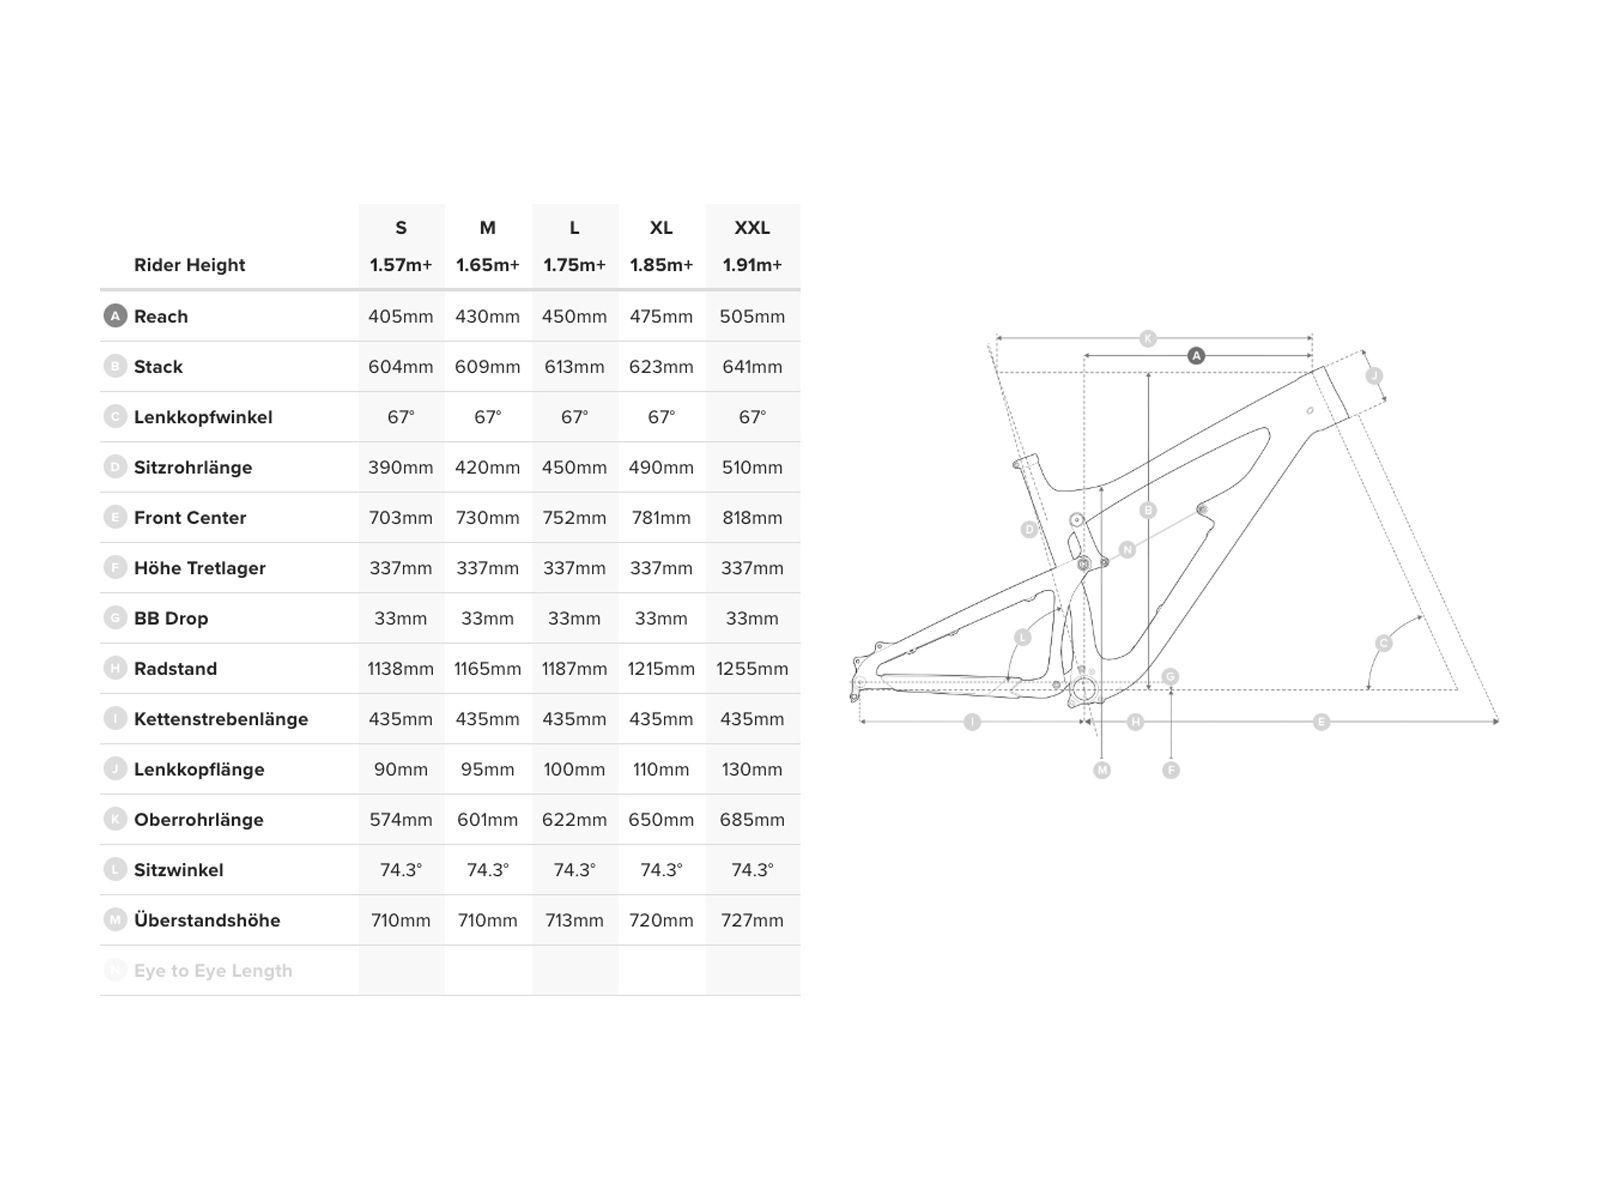 Geometria - SANTA CRUZ HIGHTOWER